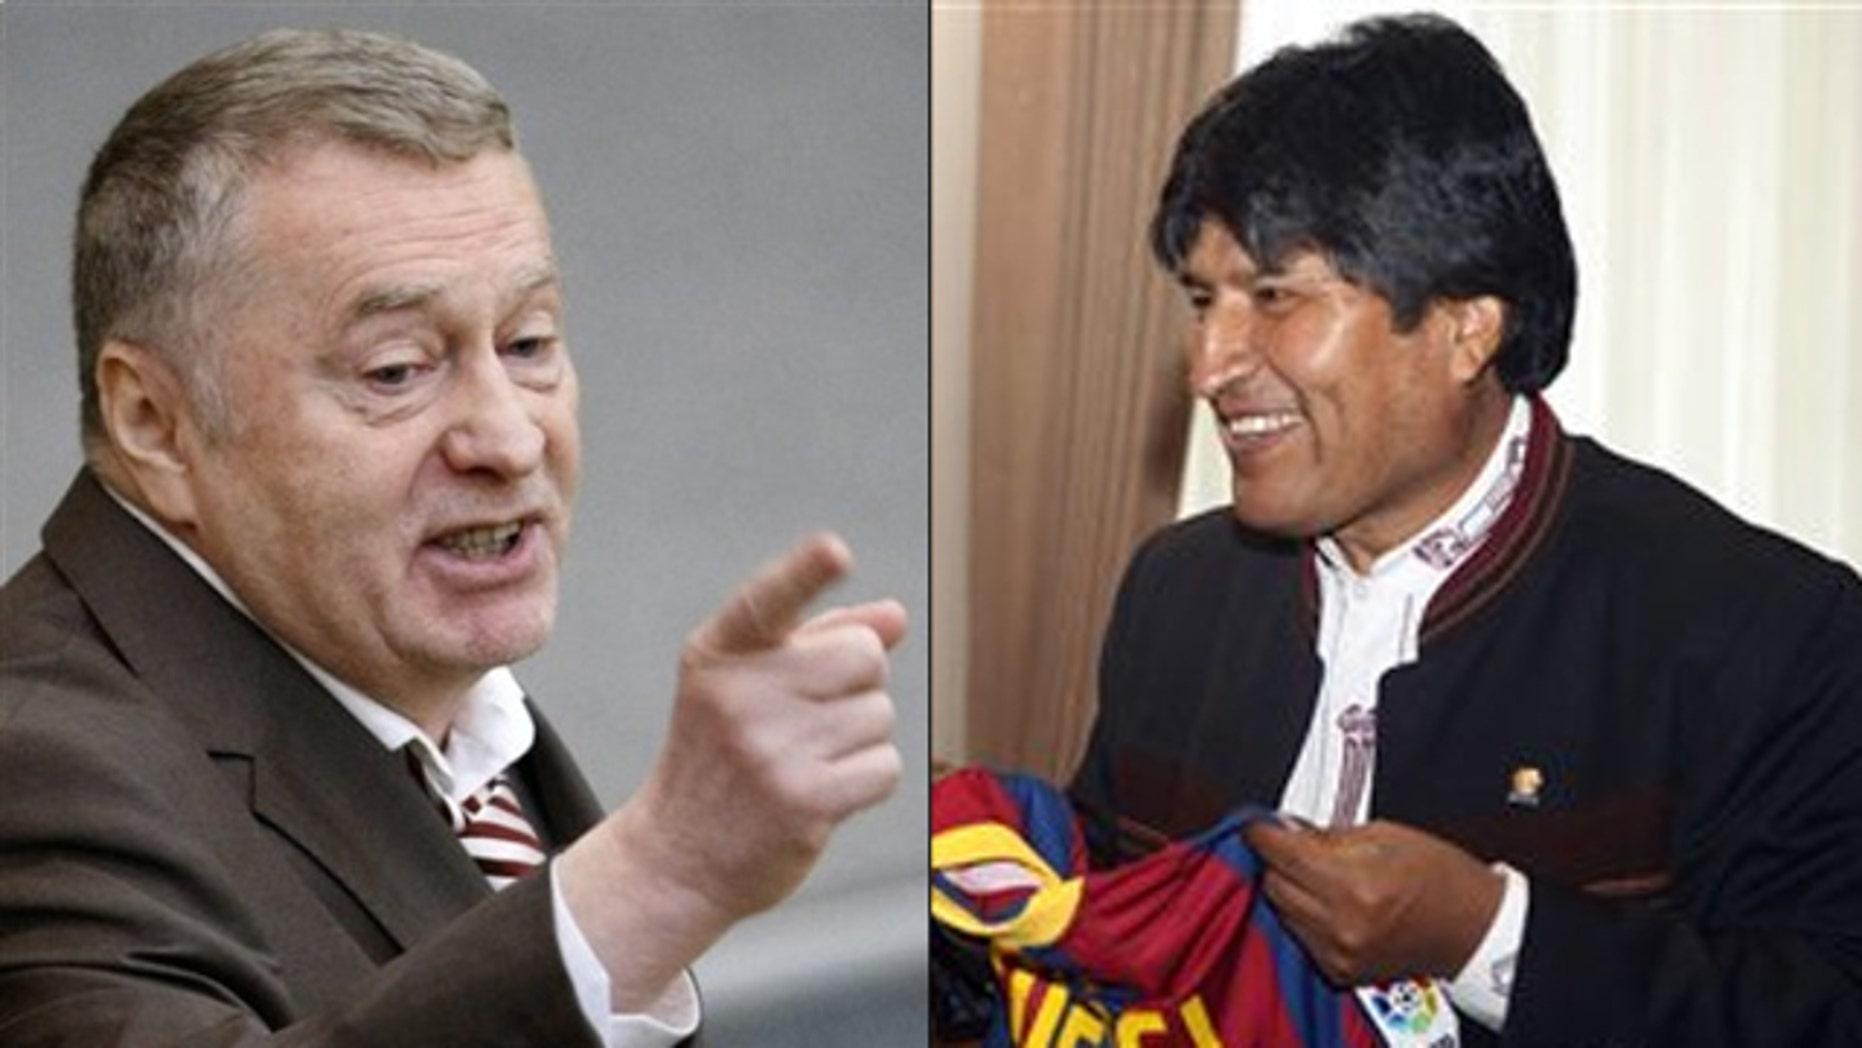 Shown here are Russian political leader Vladimir Zhirinovsky, left, and Bolivian President Evo Morales.